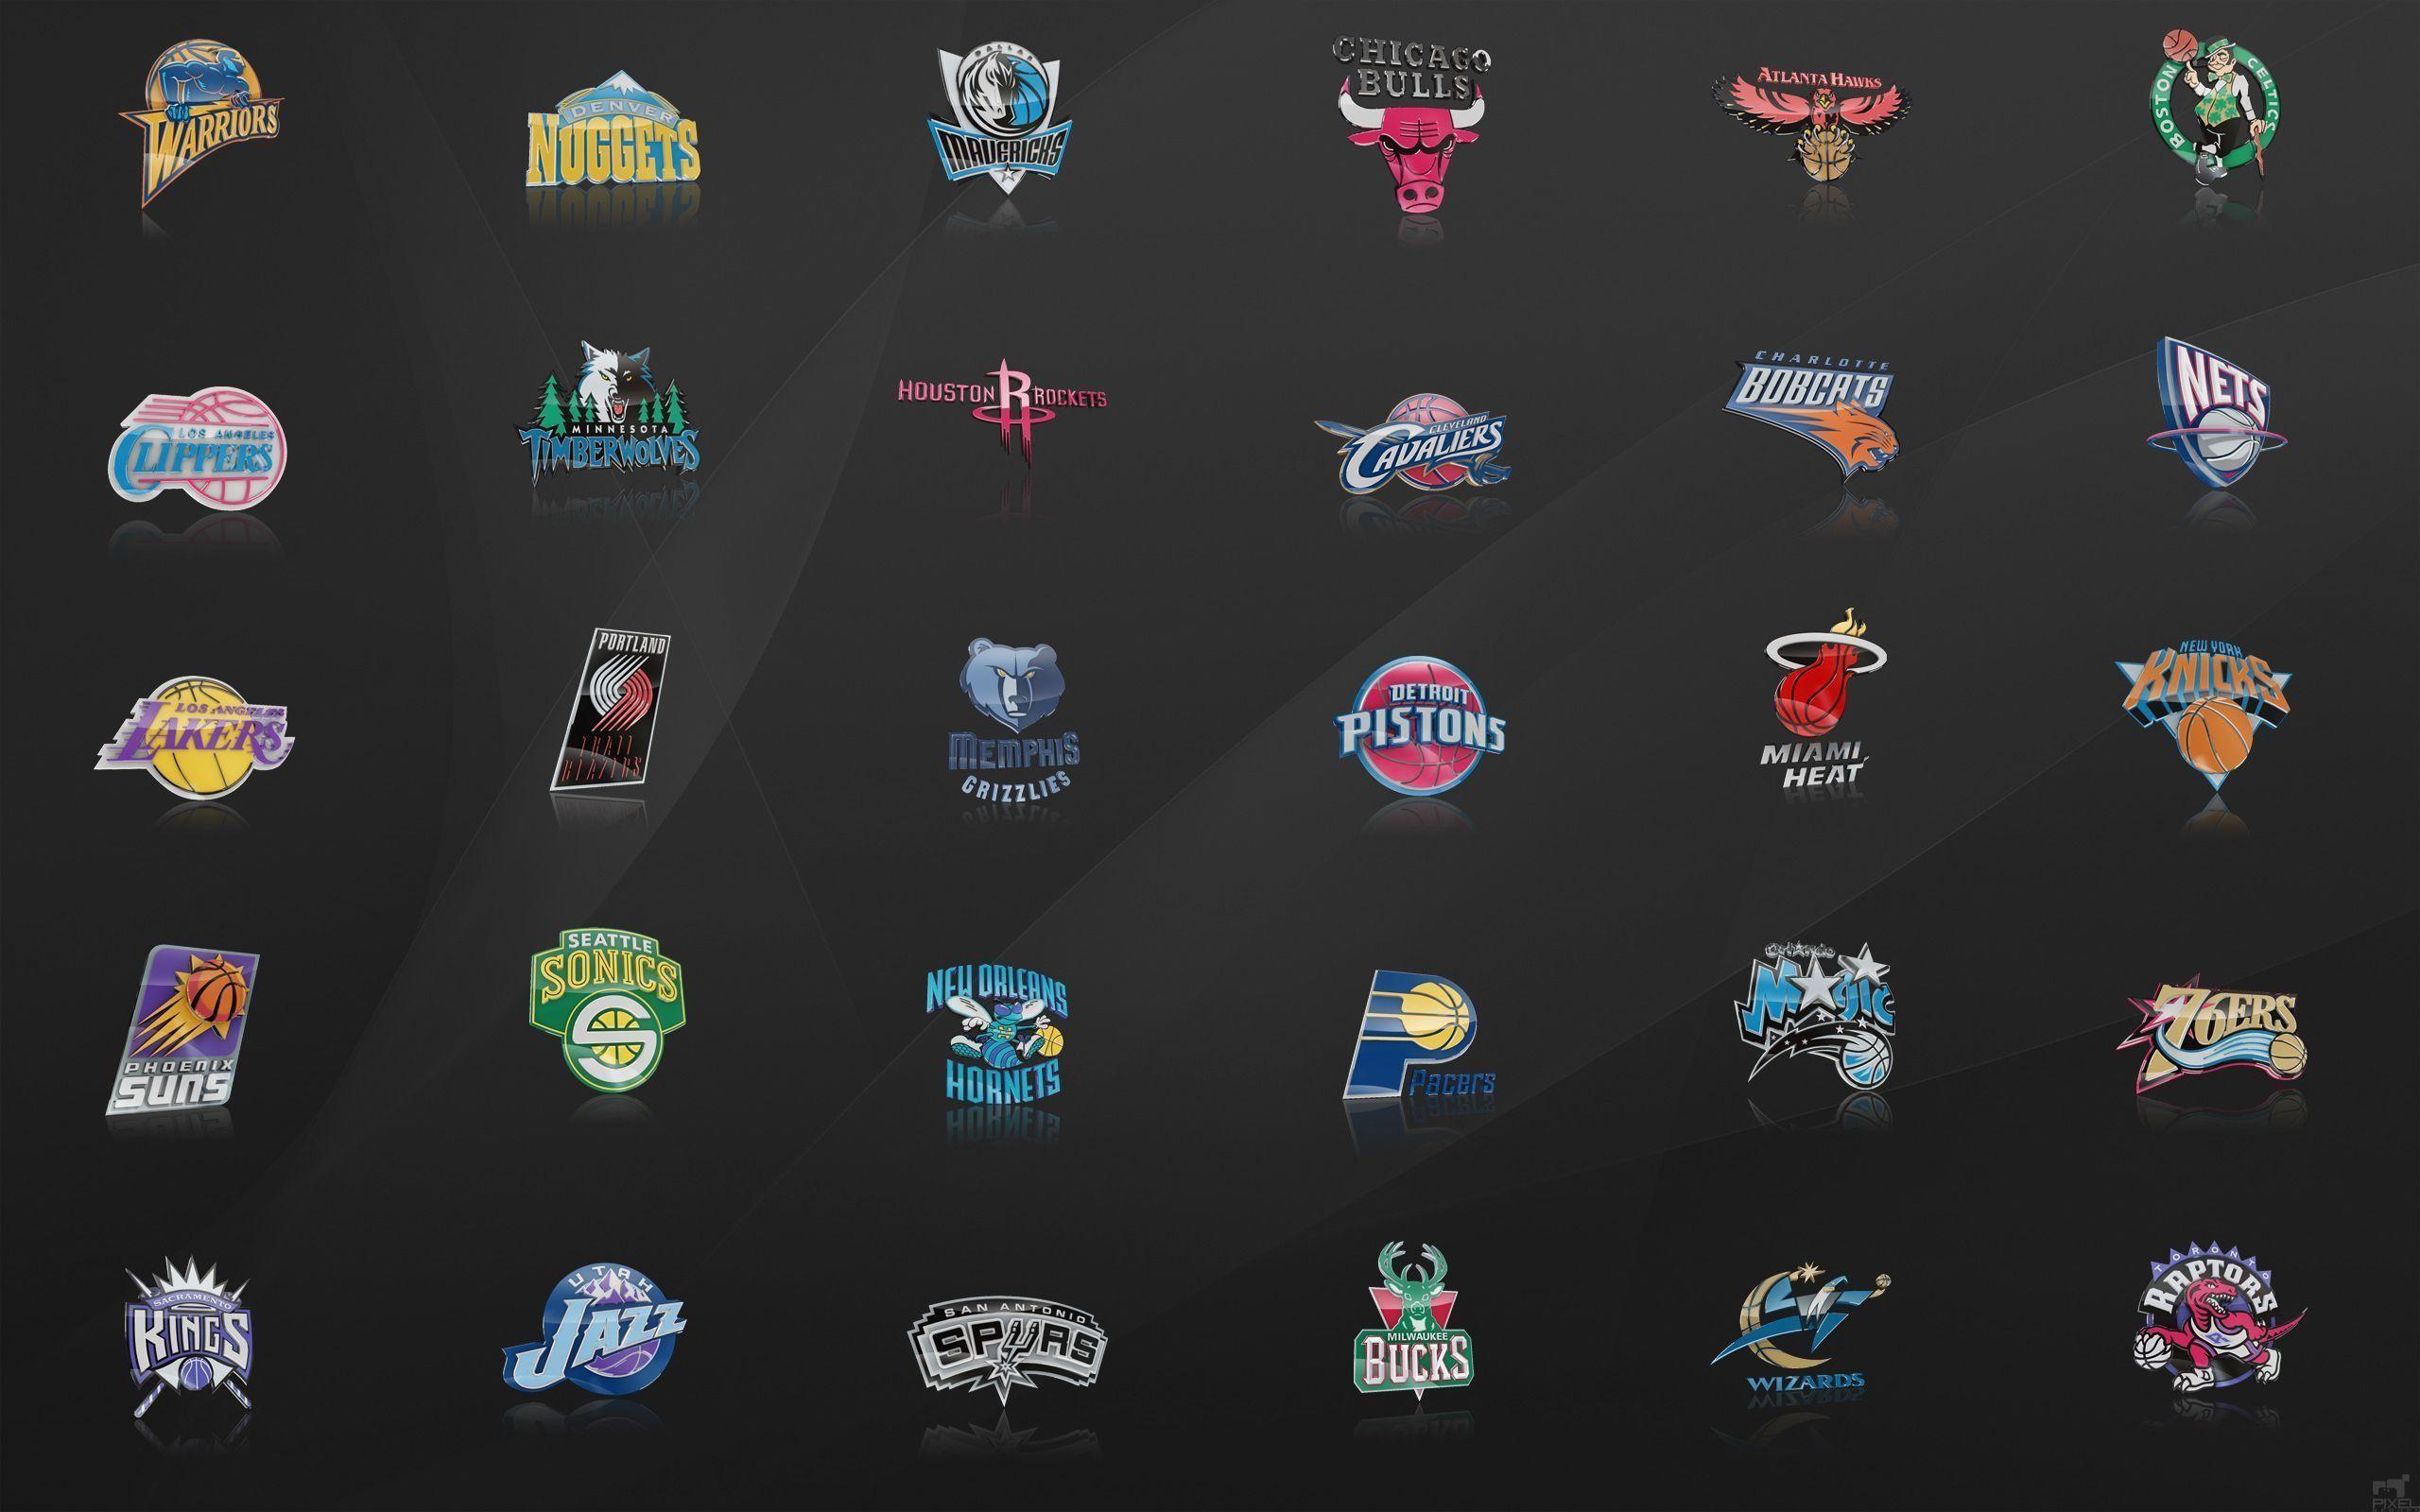 Nba Team Logos Wallpaper ① Wallpapertag